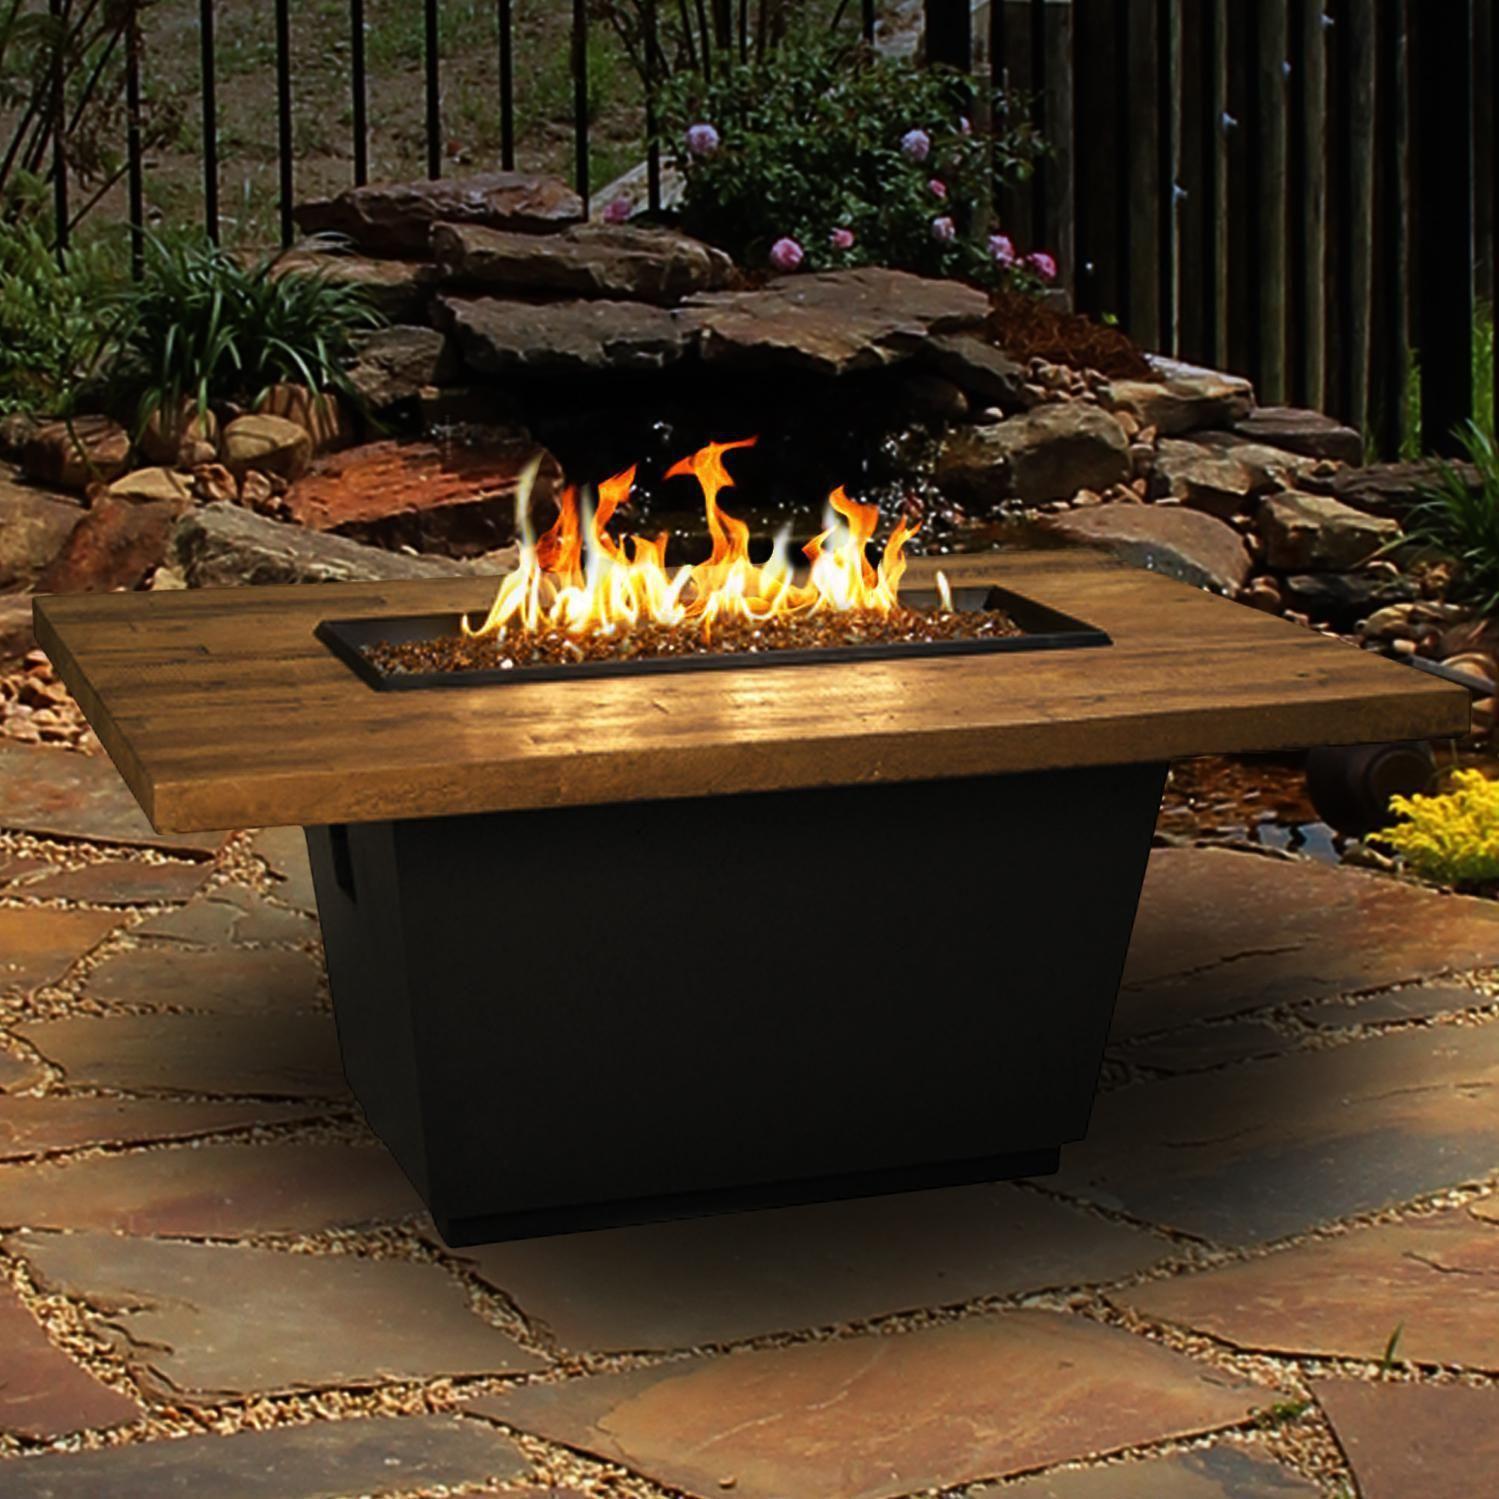 American fyre designs cosmopolitan inch french barrel oak propane